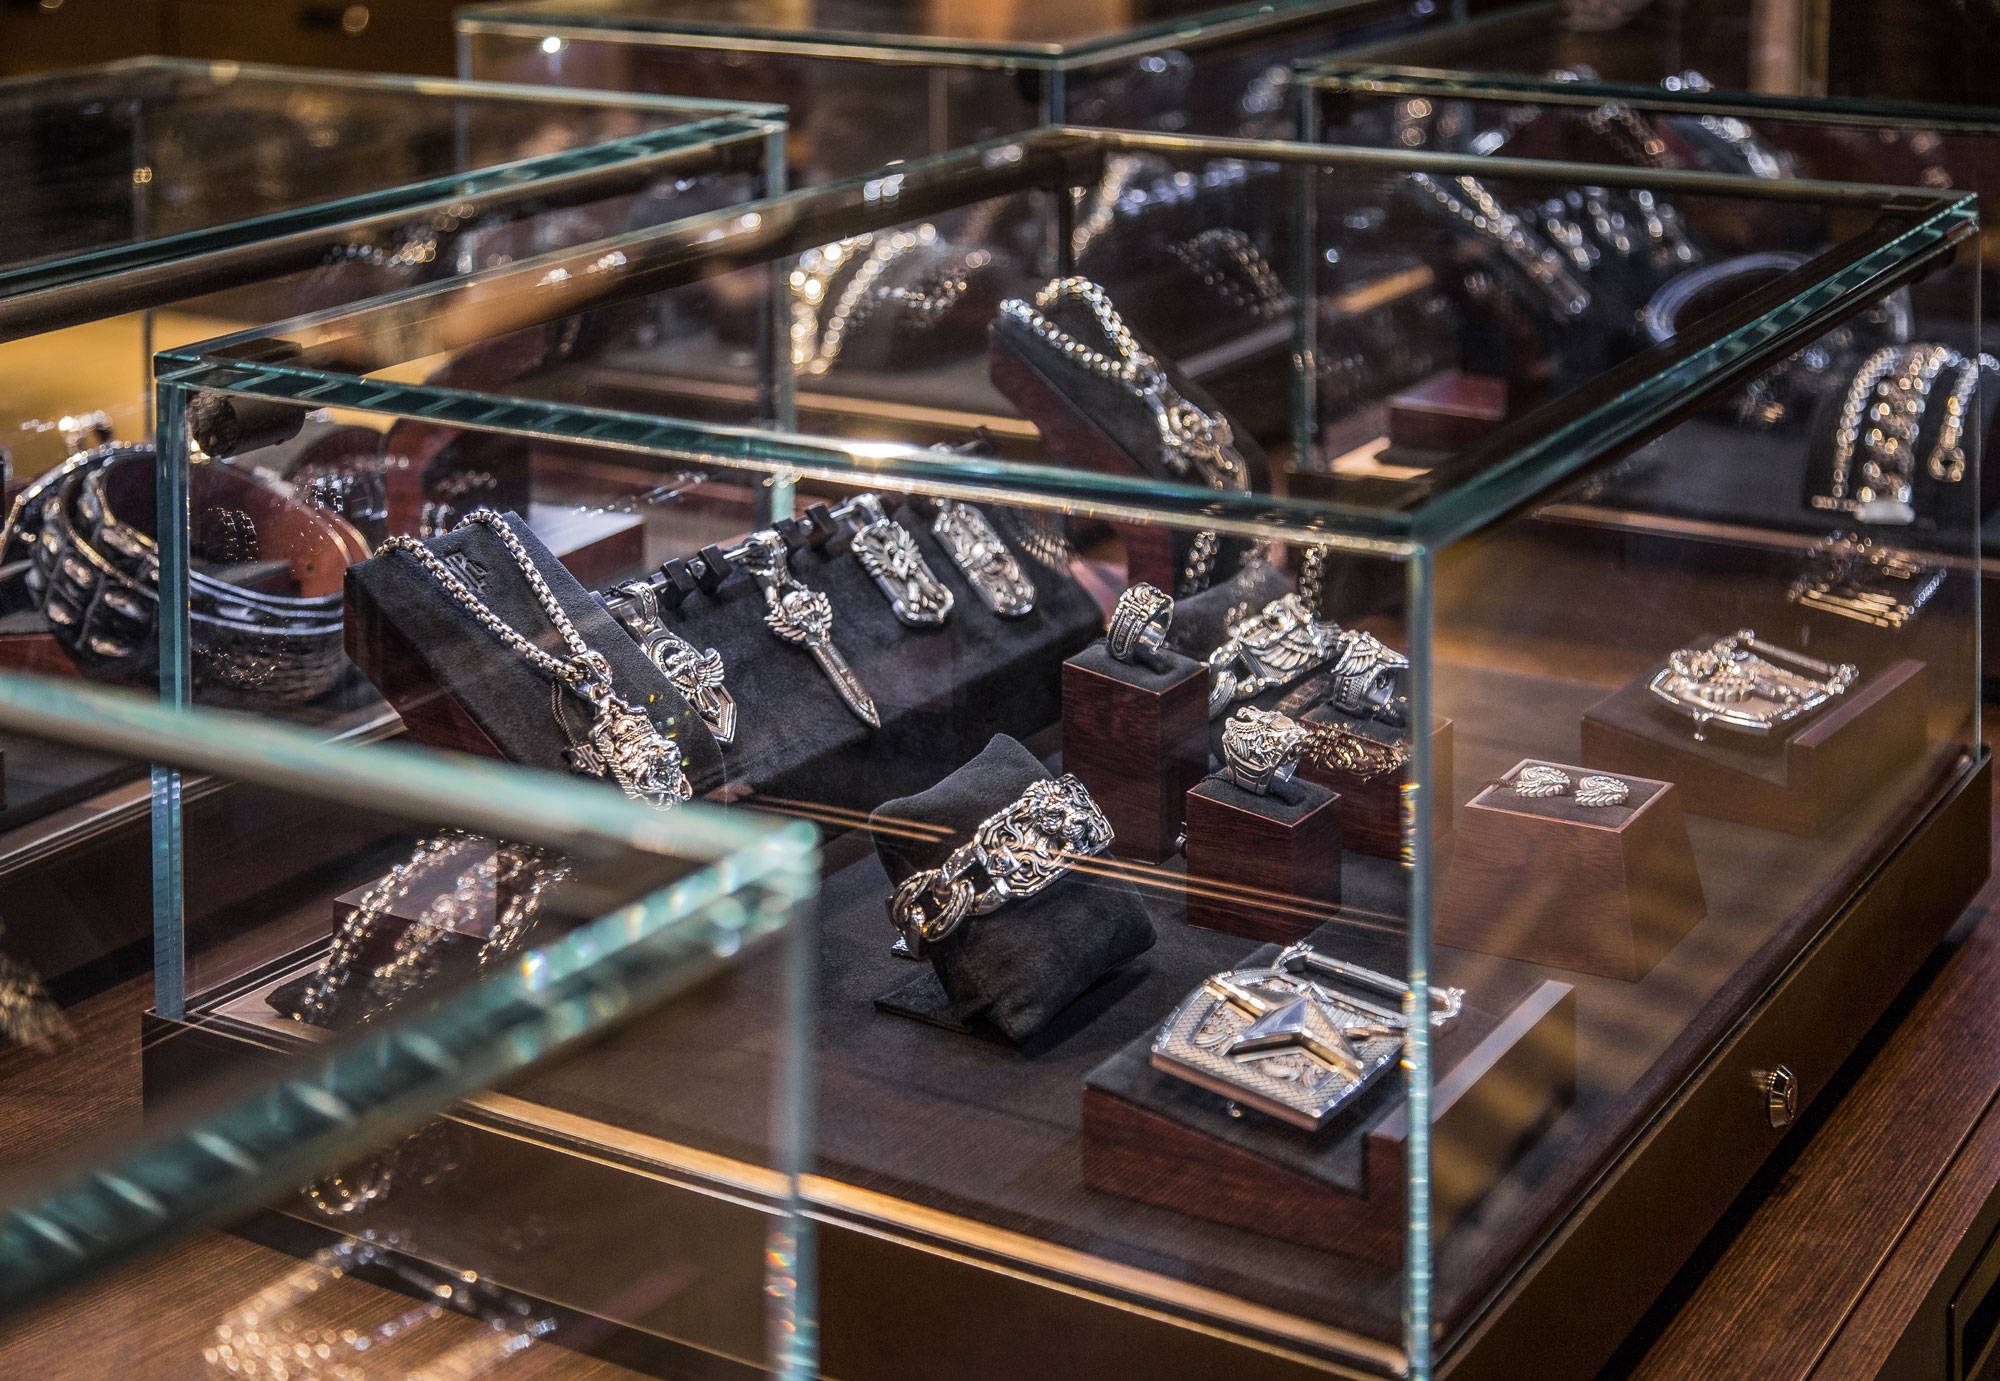 Jewelry Cases Inside NightRider Jewelry, Cherry Creek Shopping Center, Denver, Colorado - Interior